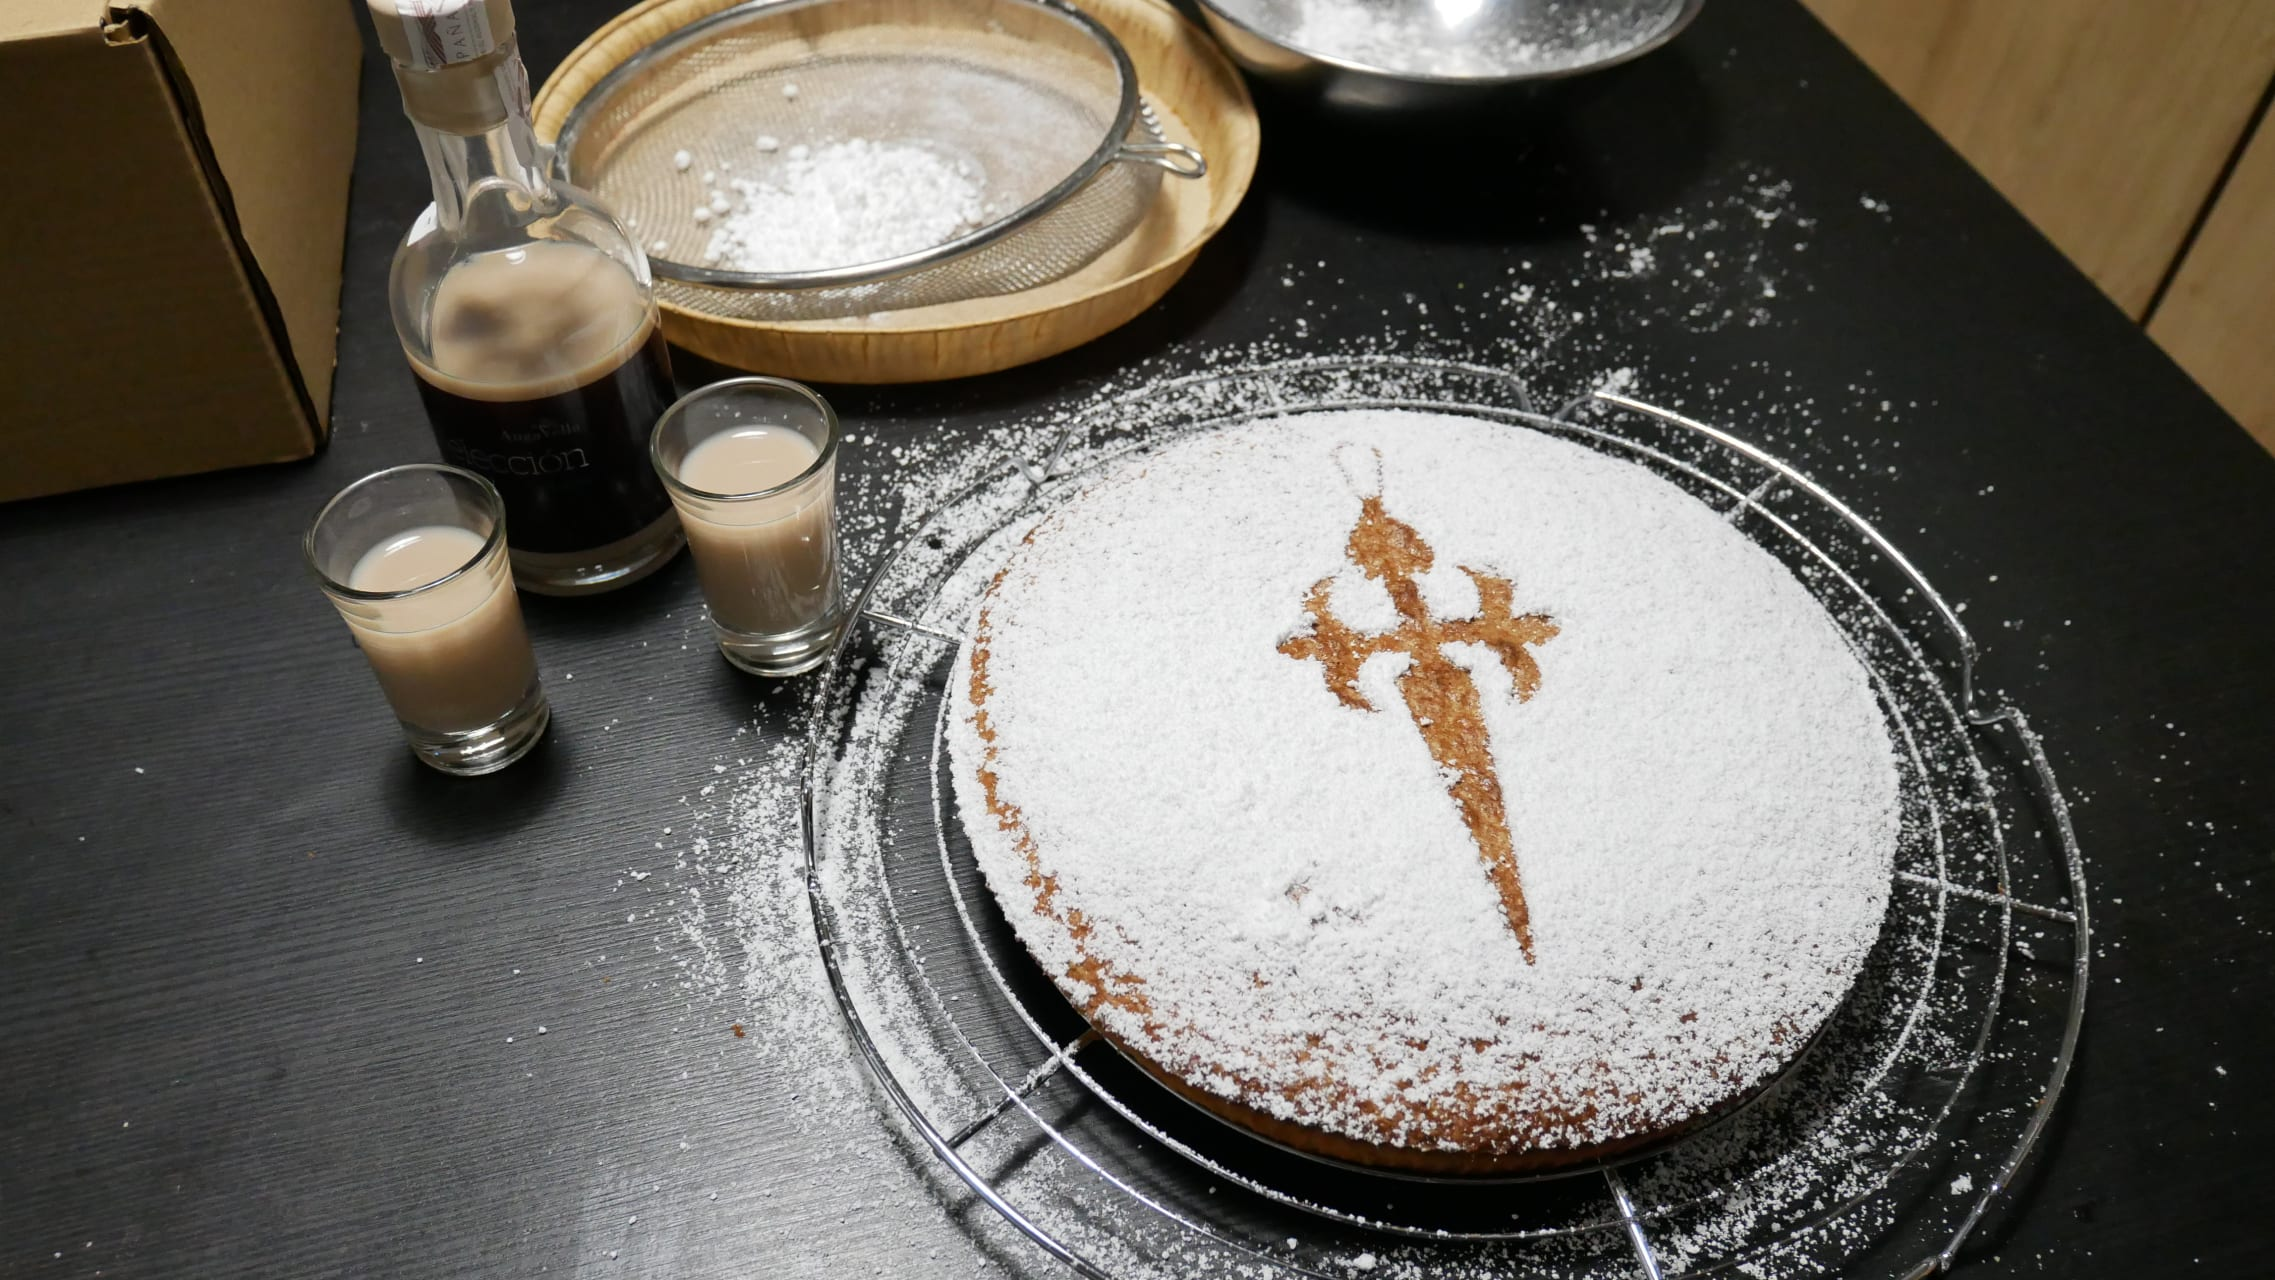 Galicia - Tarta de Santiago (Cake of St. James) for the Holy Year Xacobeo 2021